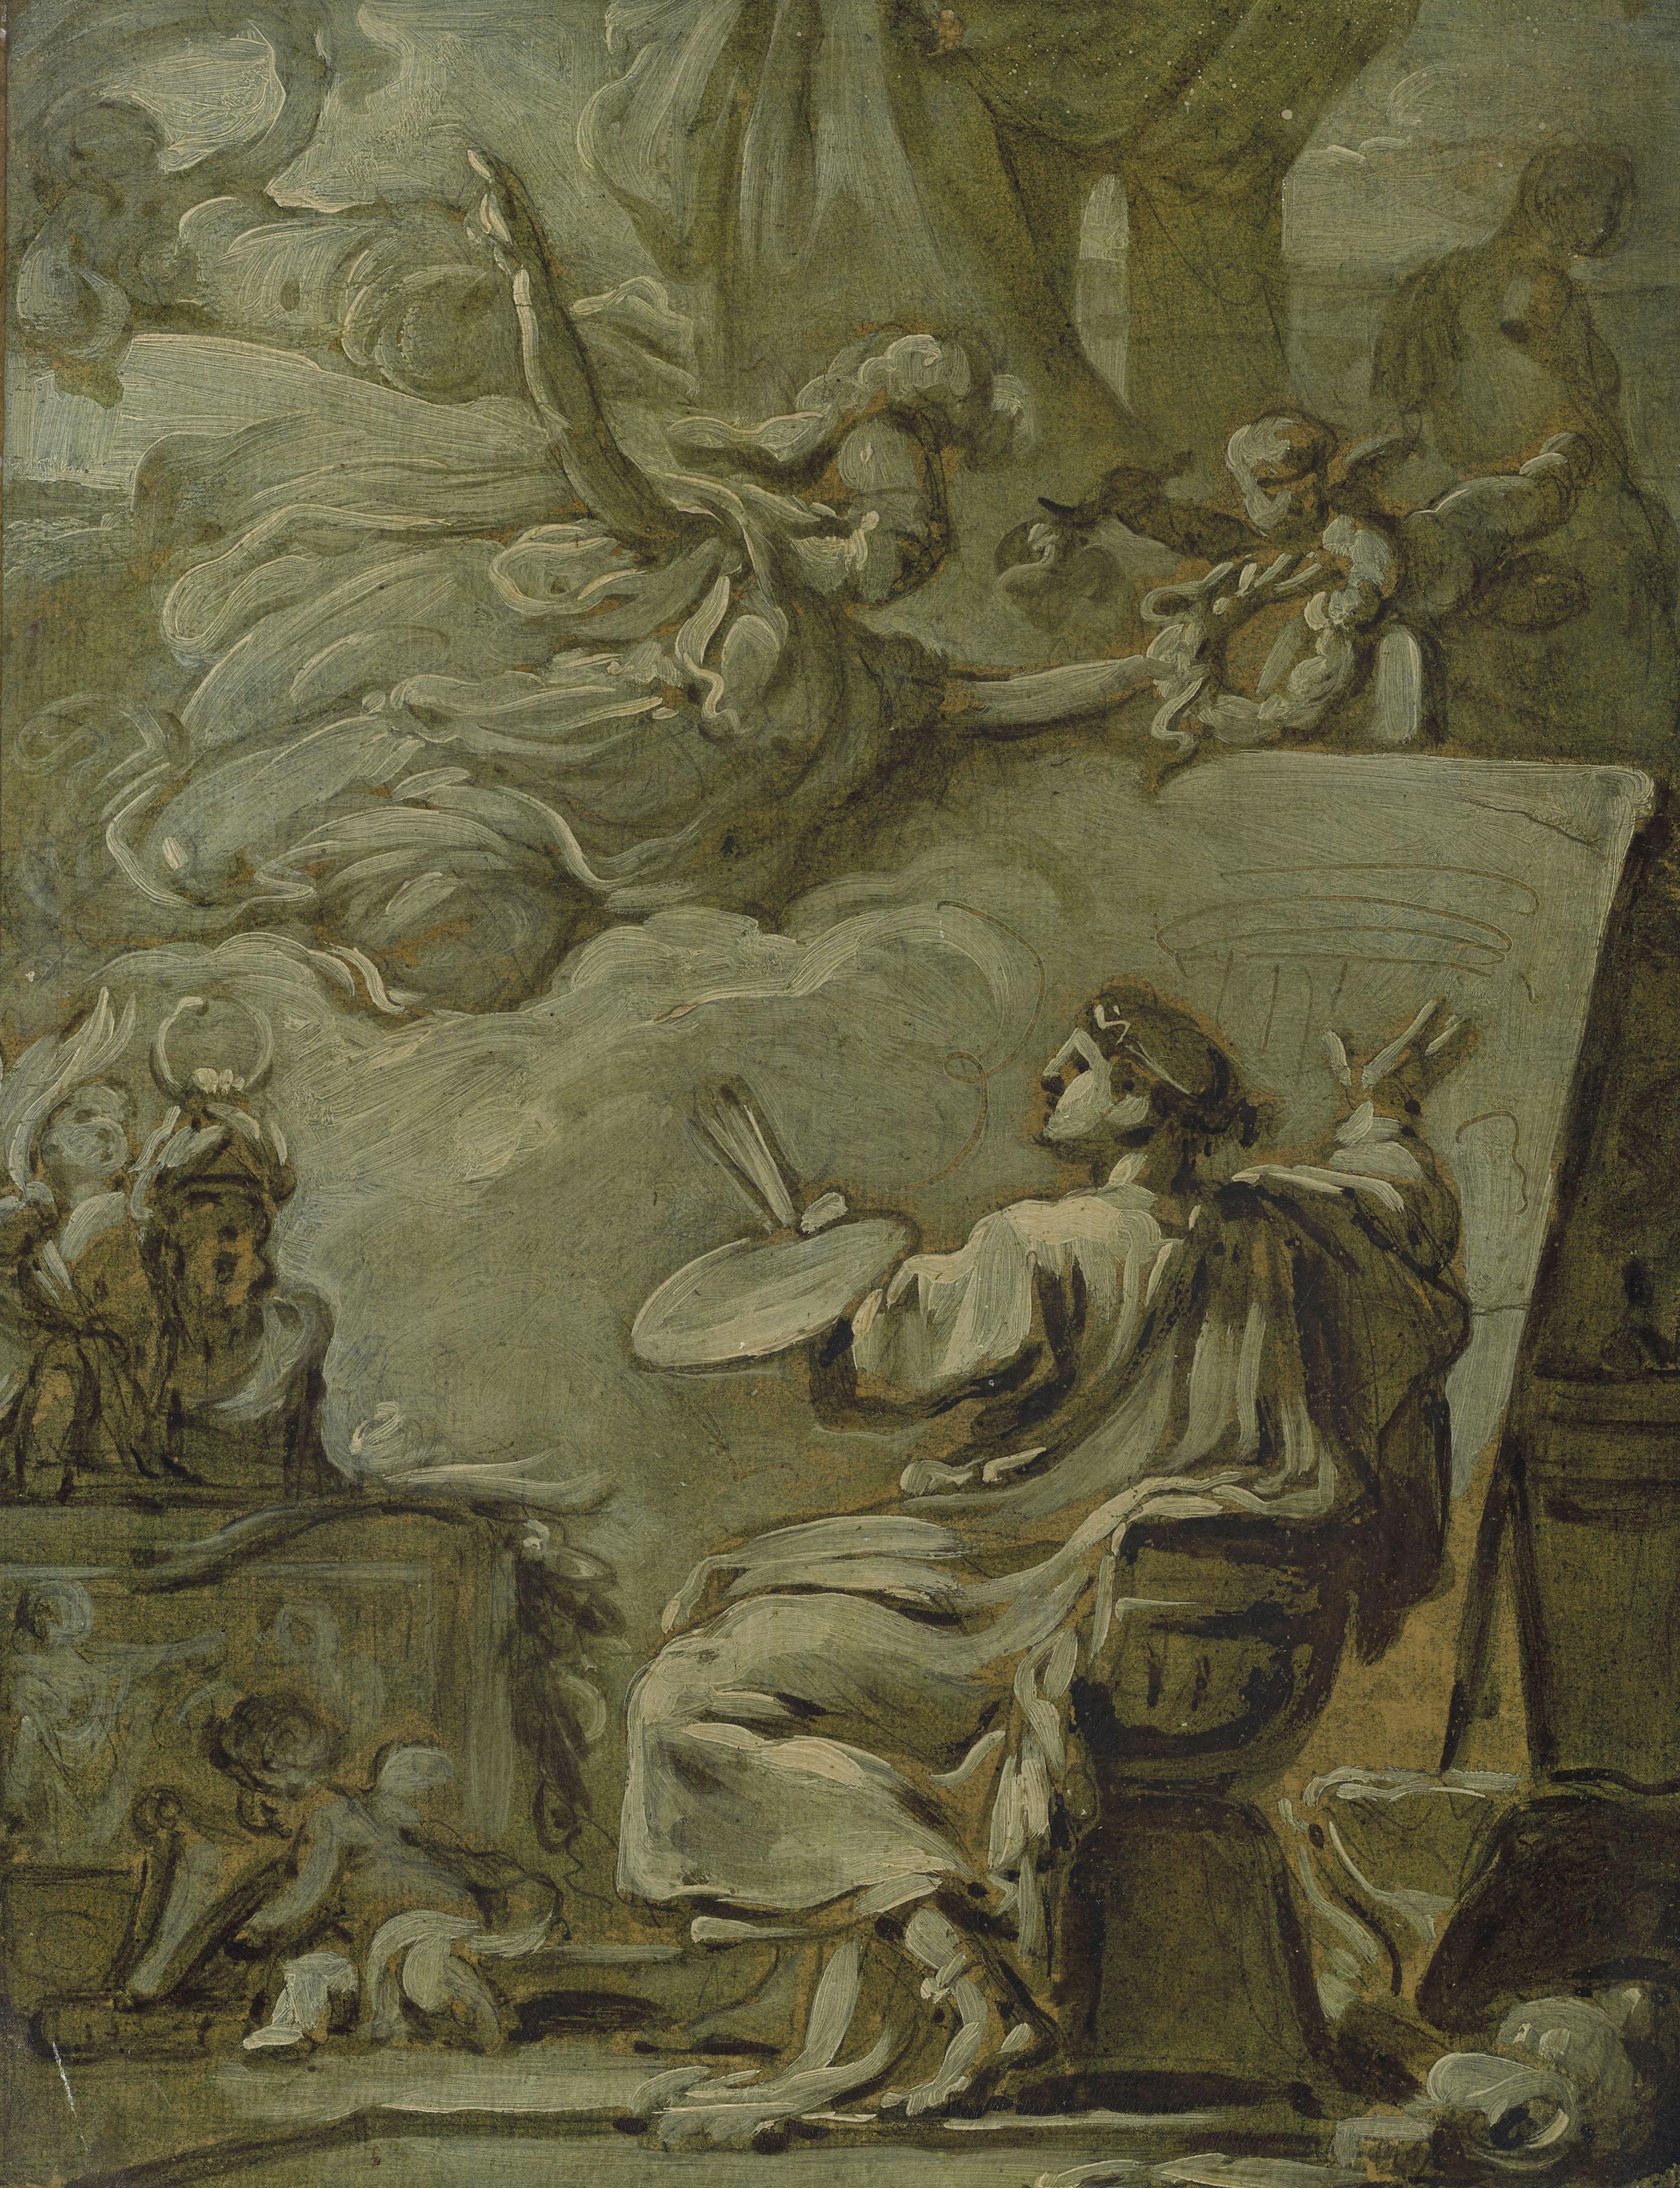 JEAN TOUZE (PARIS 1747-1809)